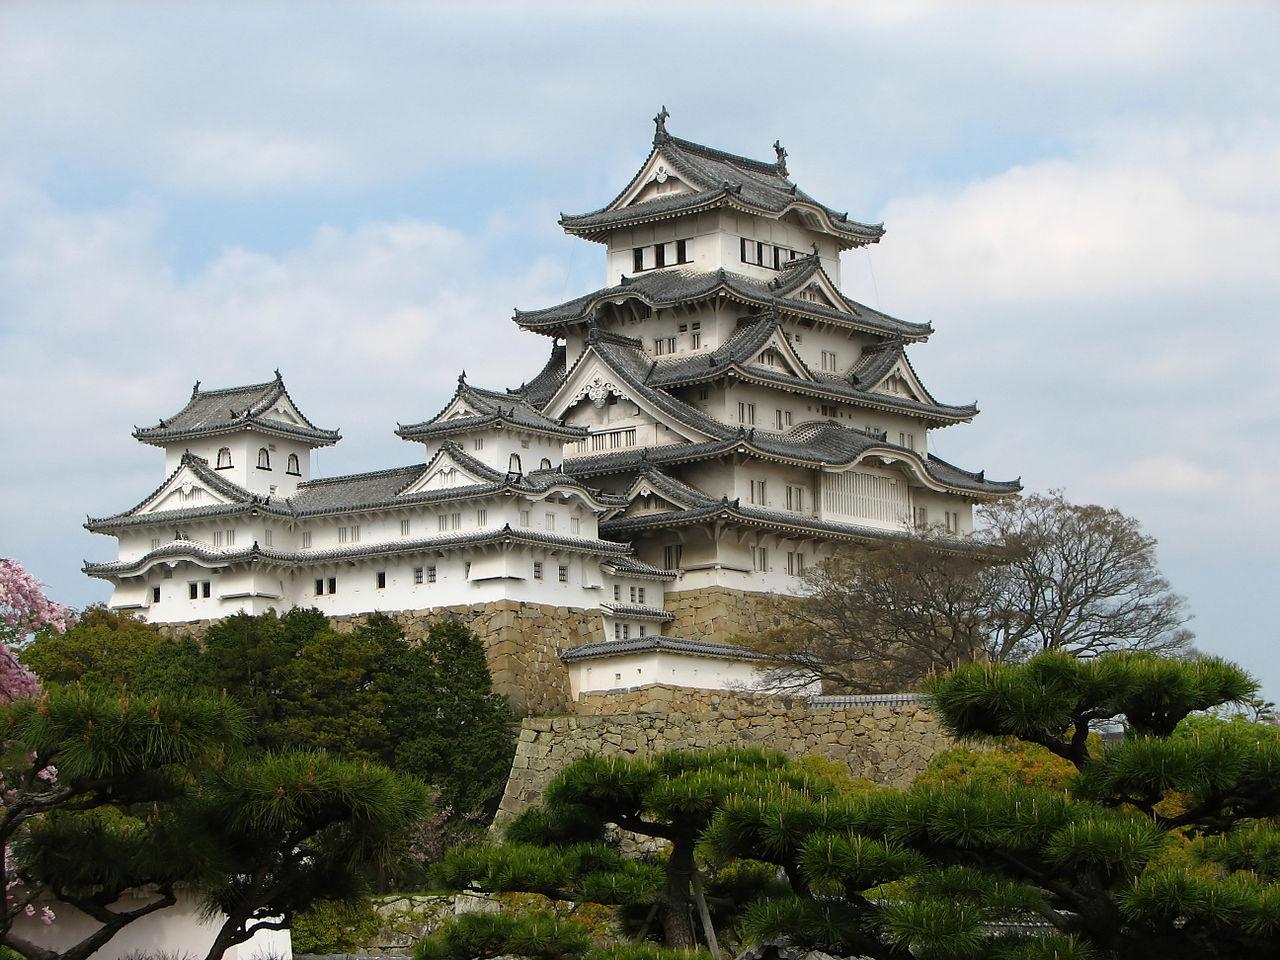 Himeji castle himeji hyogo prefecture japan dauntless jaunter himeji castle himeji hyogo prefecture japan publicscrutiny Images